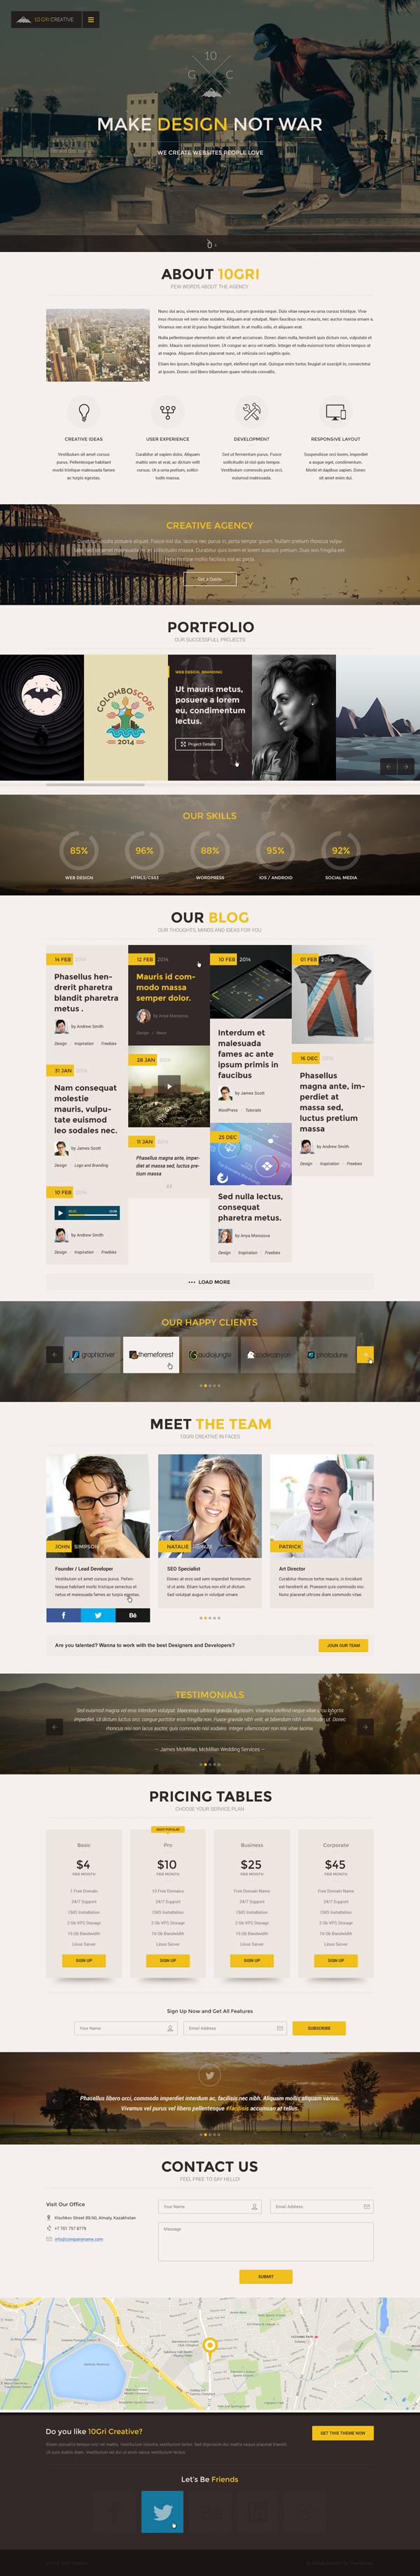 105GriCreative - OnePage PSD HTML5 Theme